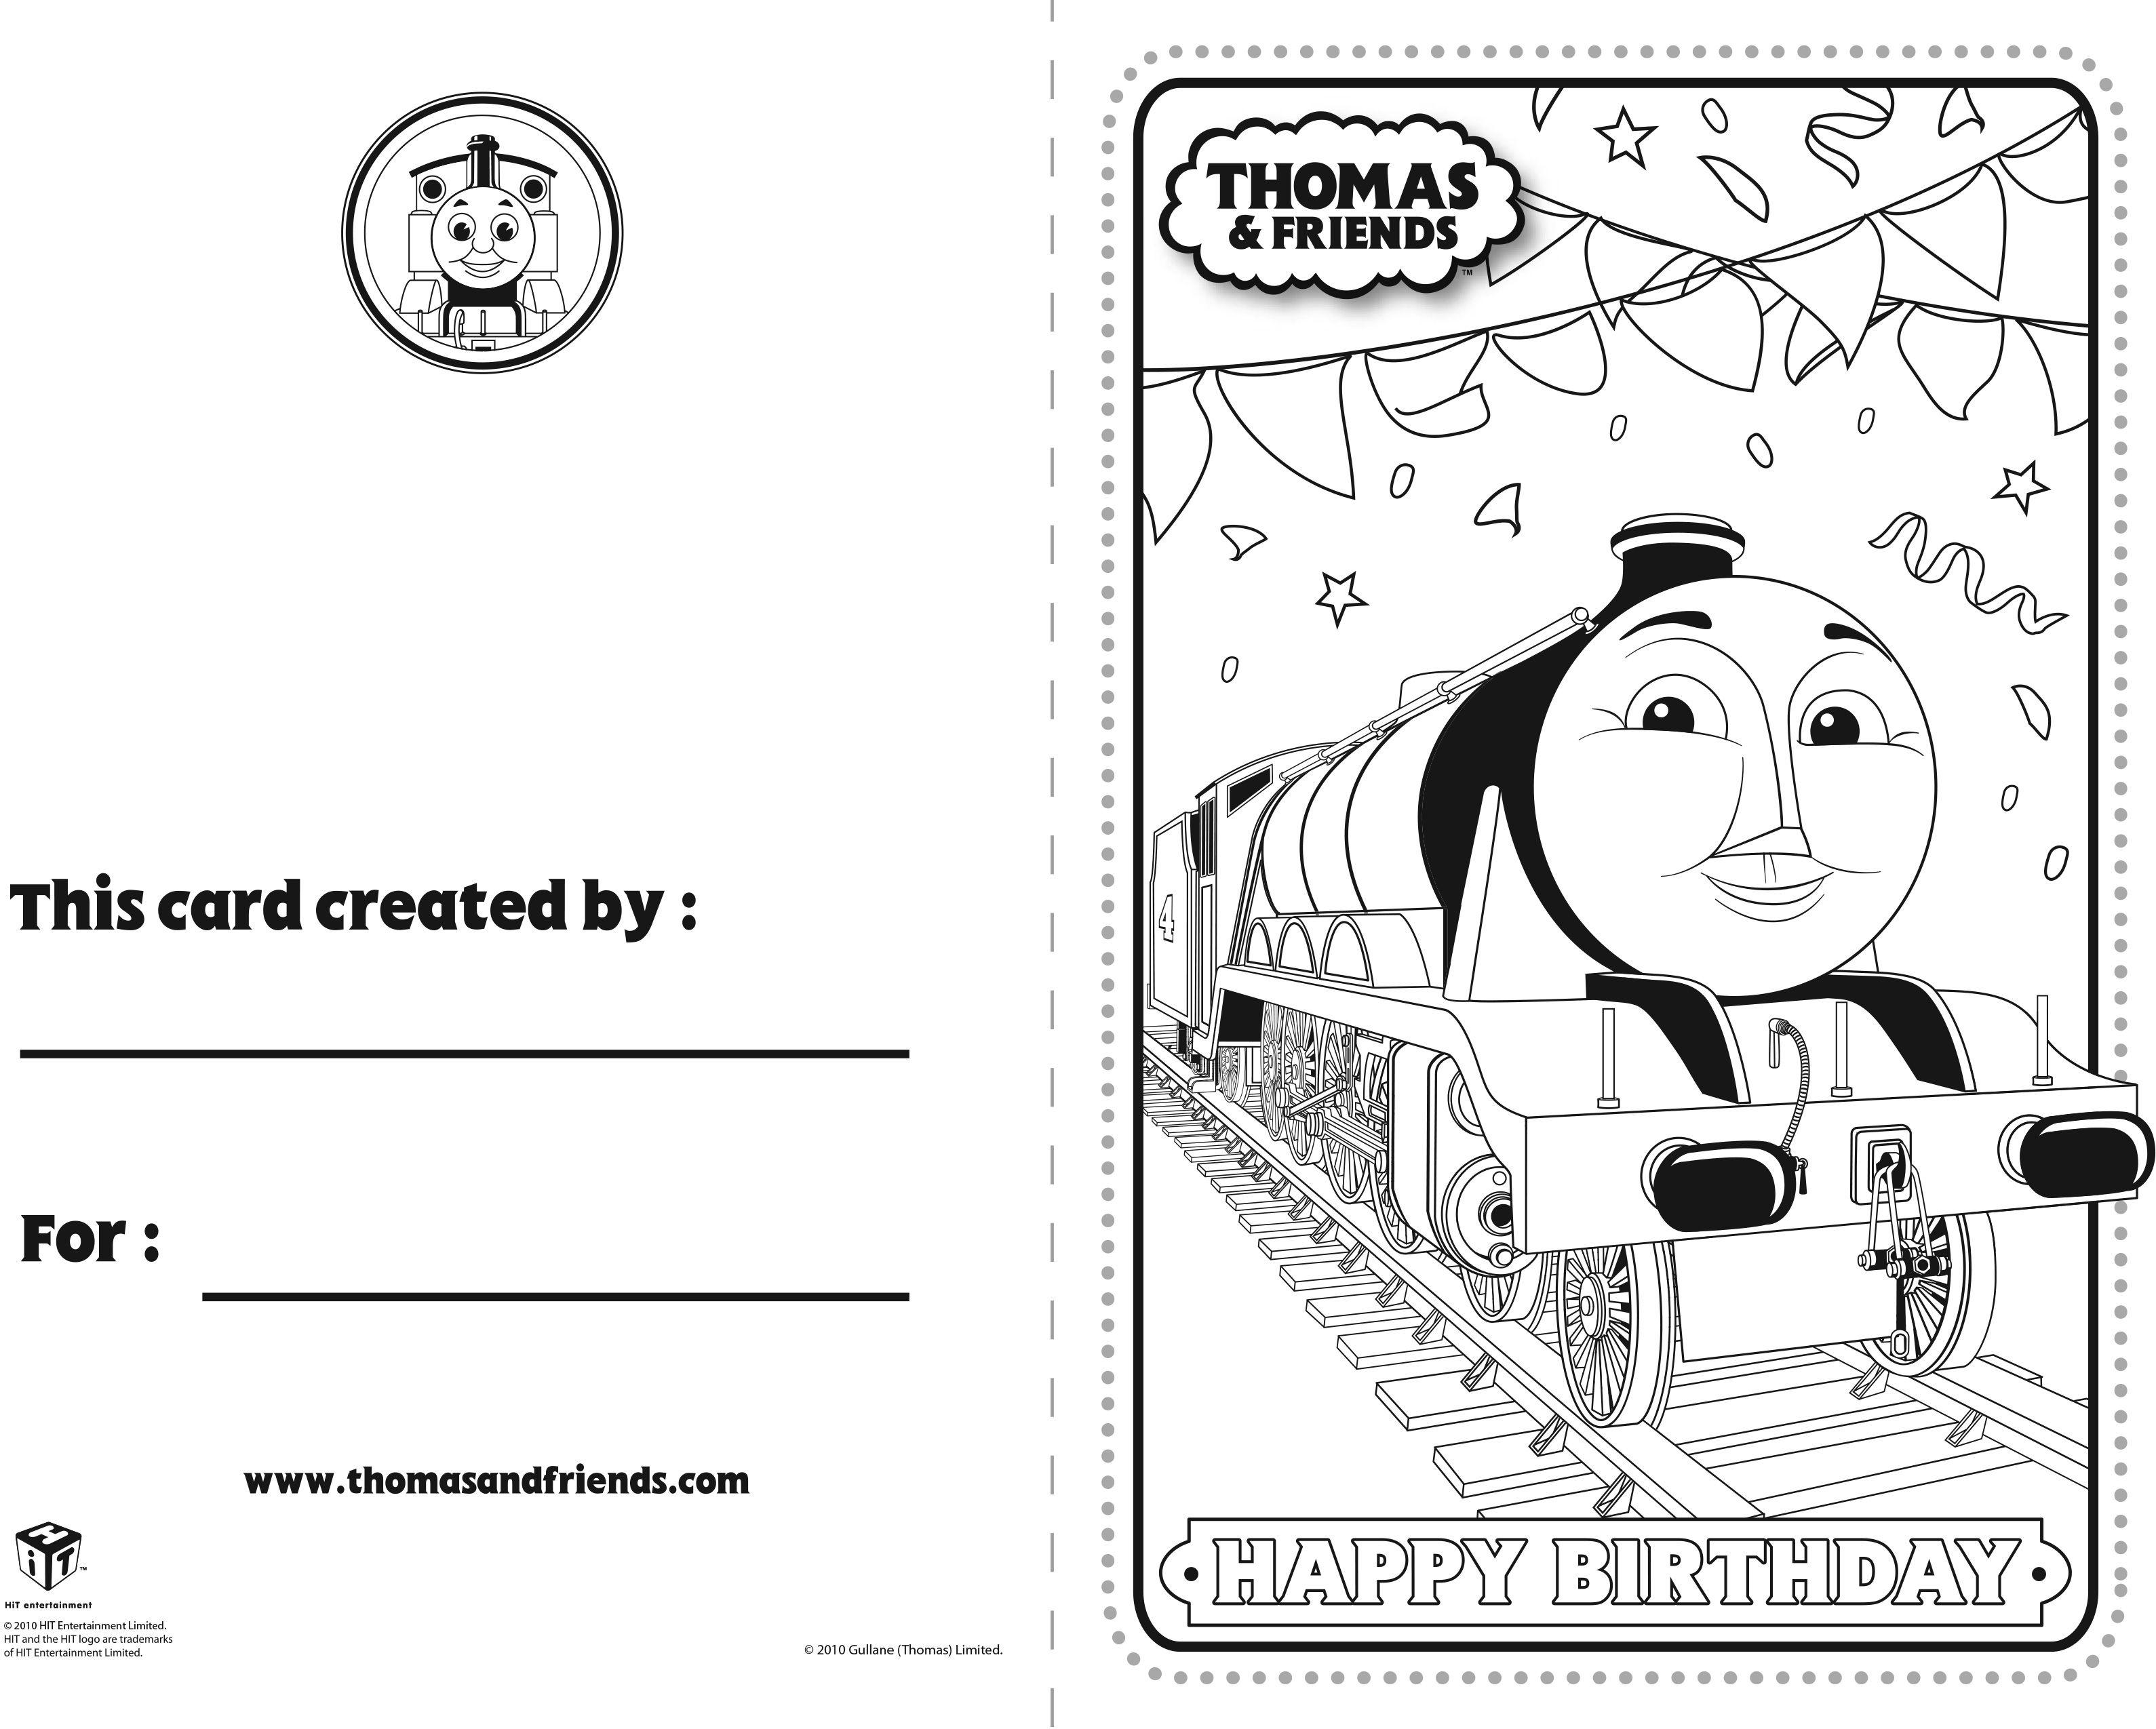 Thomas And Friends Birthday Card Gordon